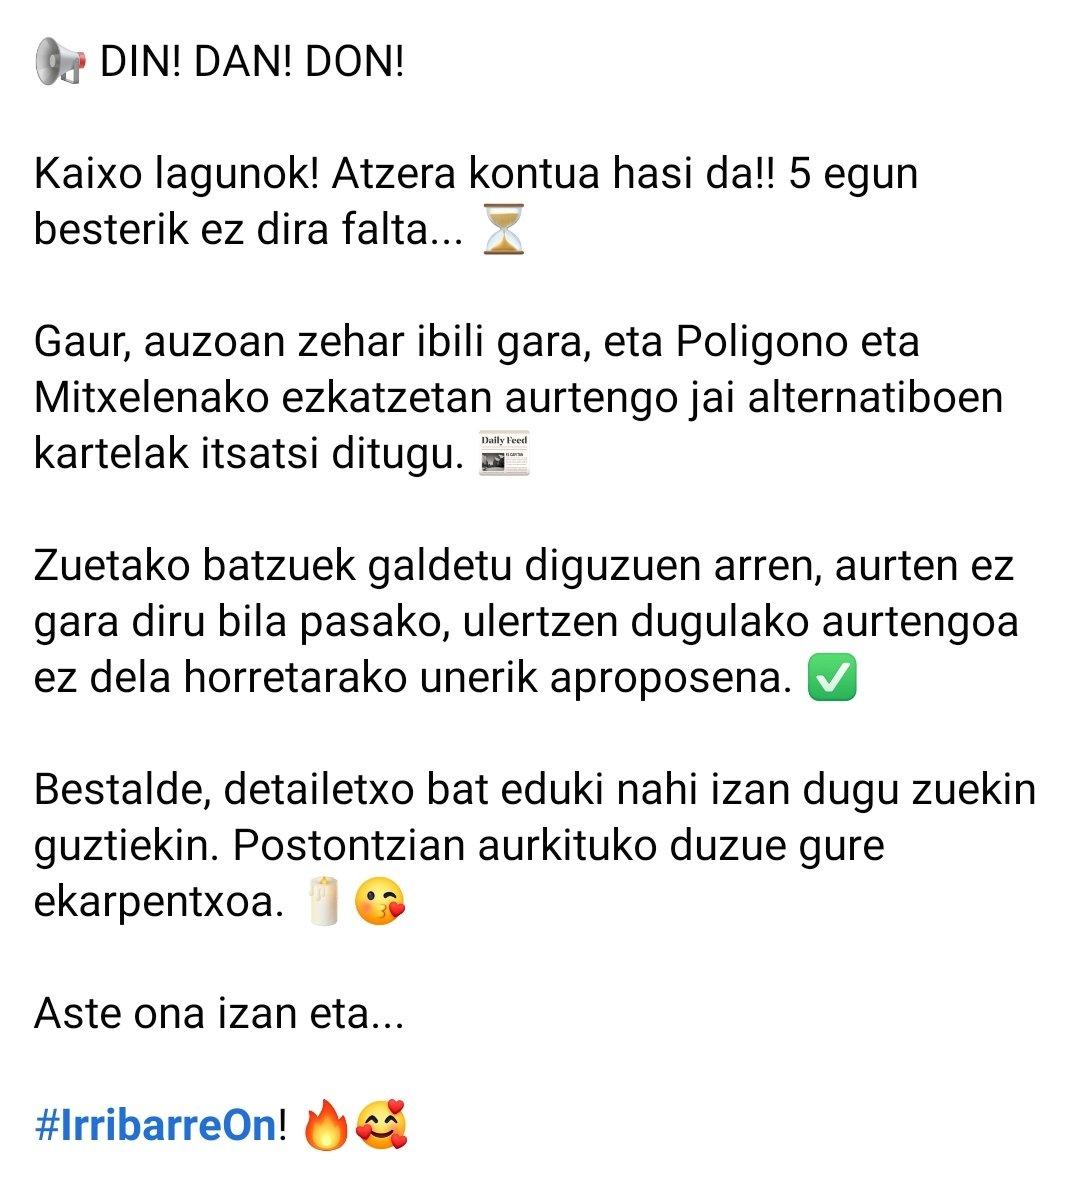 @Zelaiondo #Zarautz #IrribarreOn! 🔥 https://t.co/gDRKIBp3fn